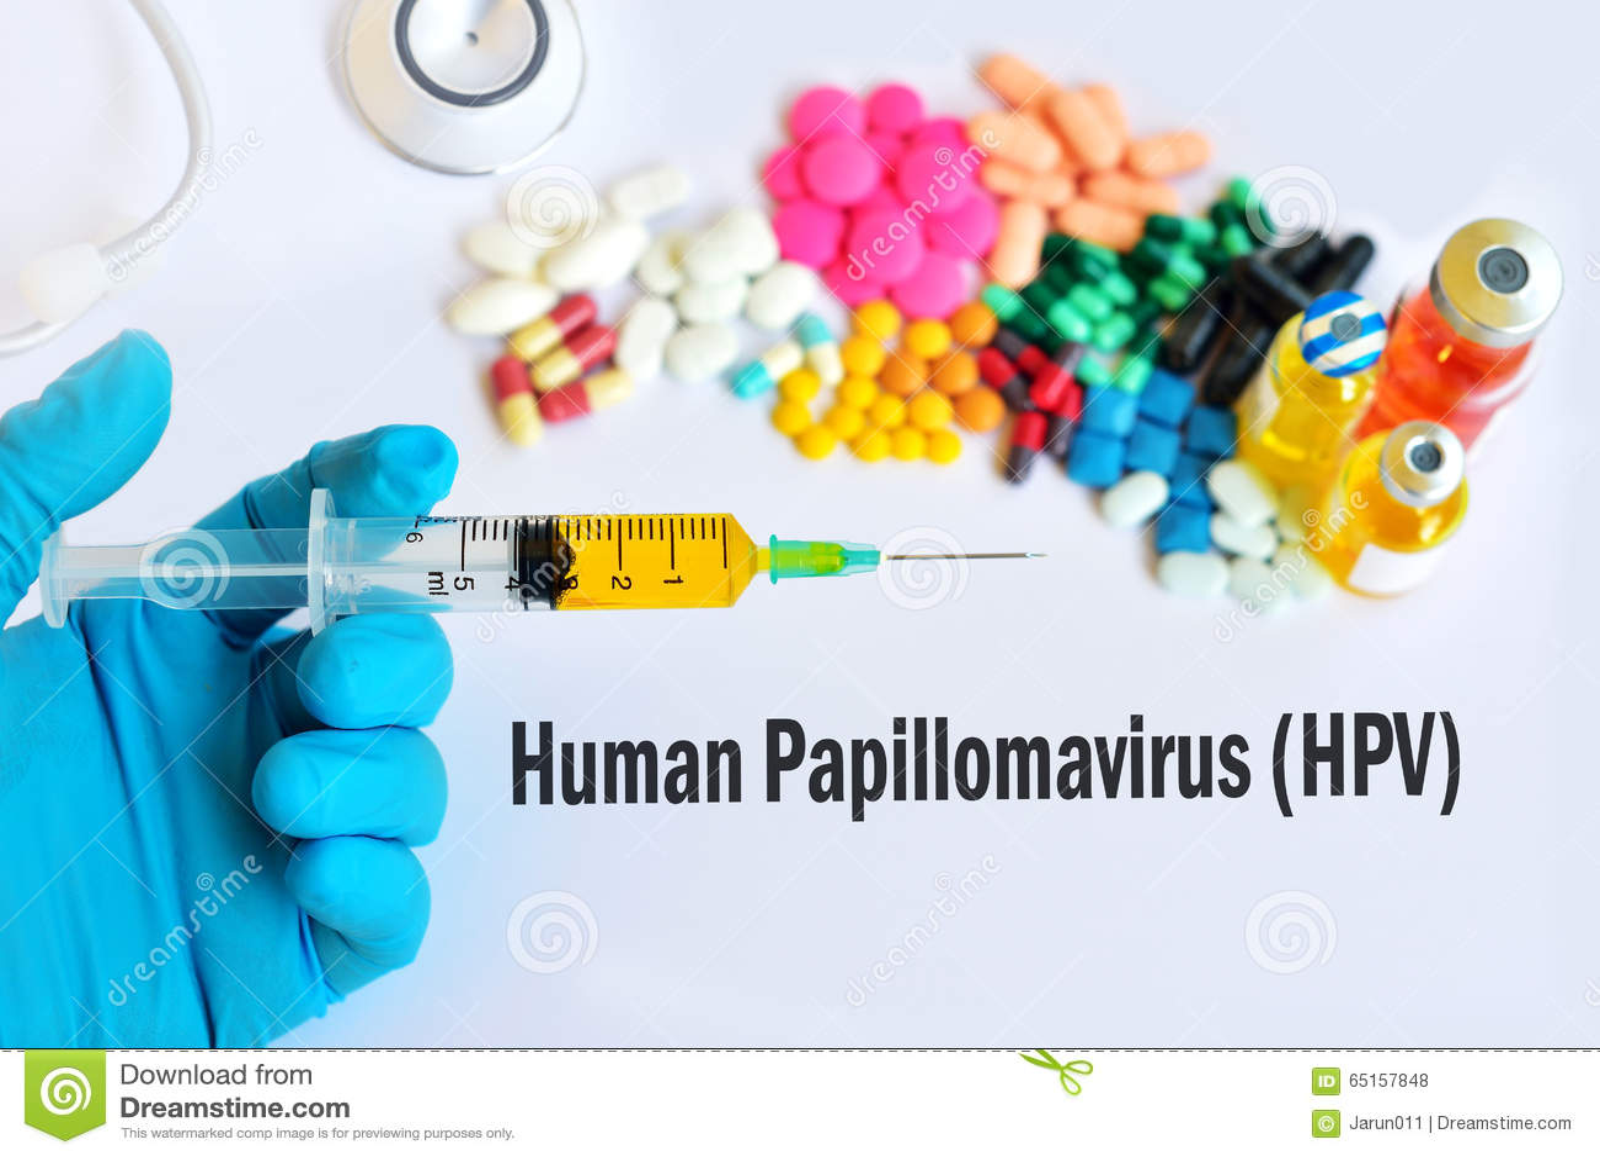 medical treatment for human papillomavirus)